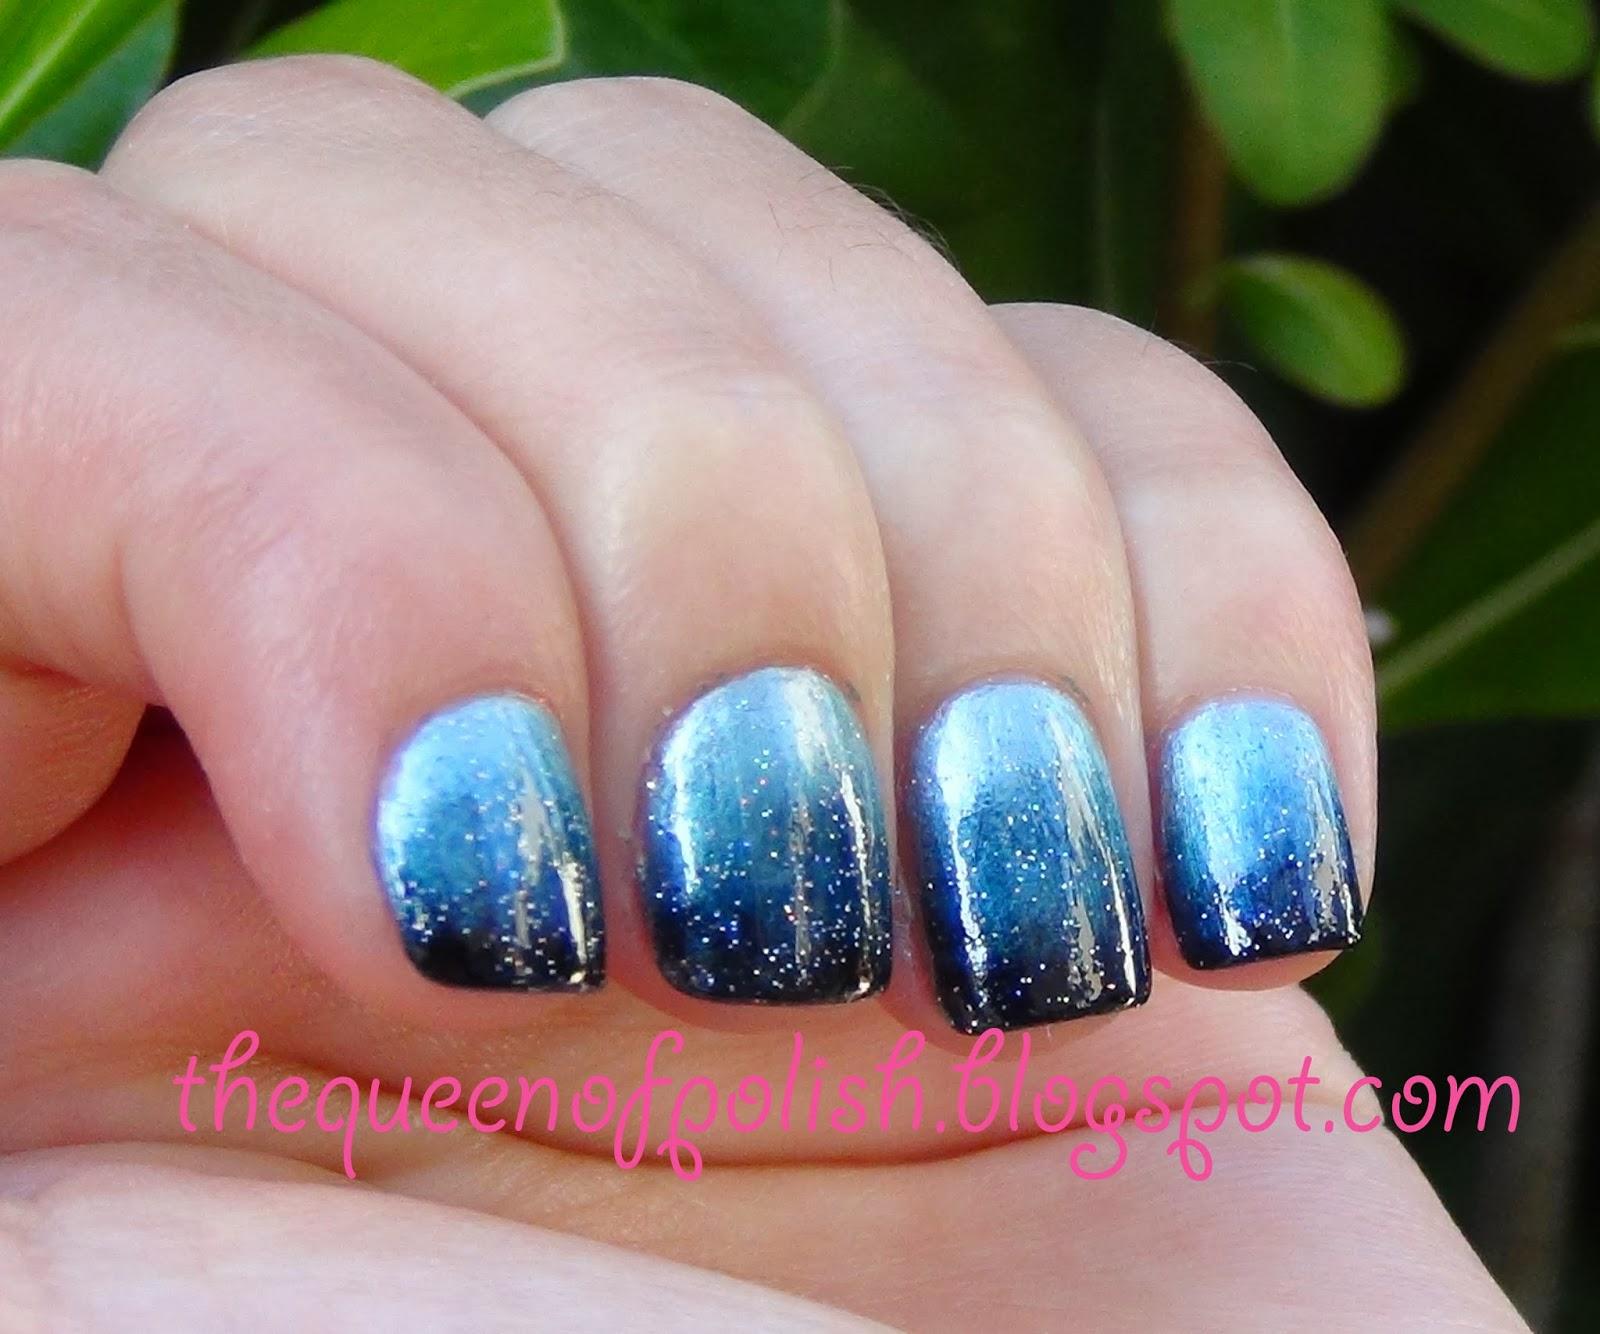 Queen Of Polish: Gradient Night Sky Nails